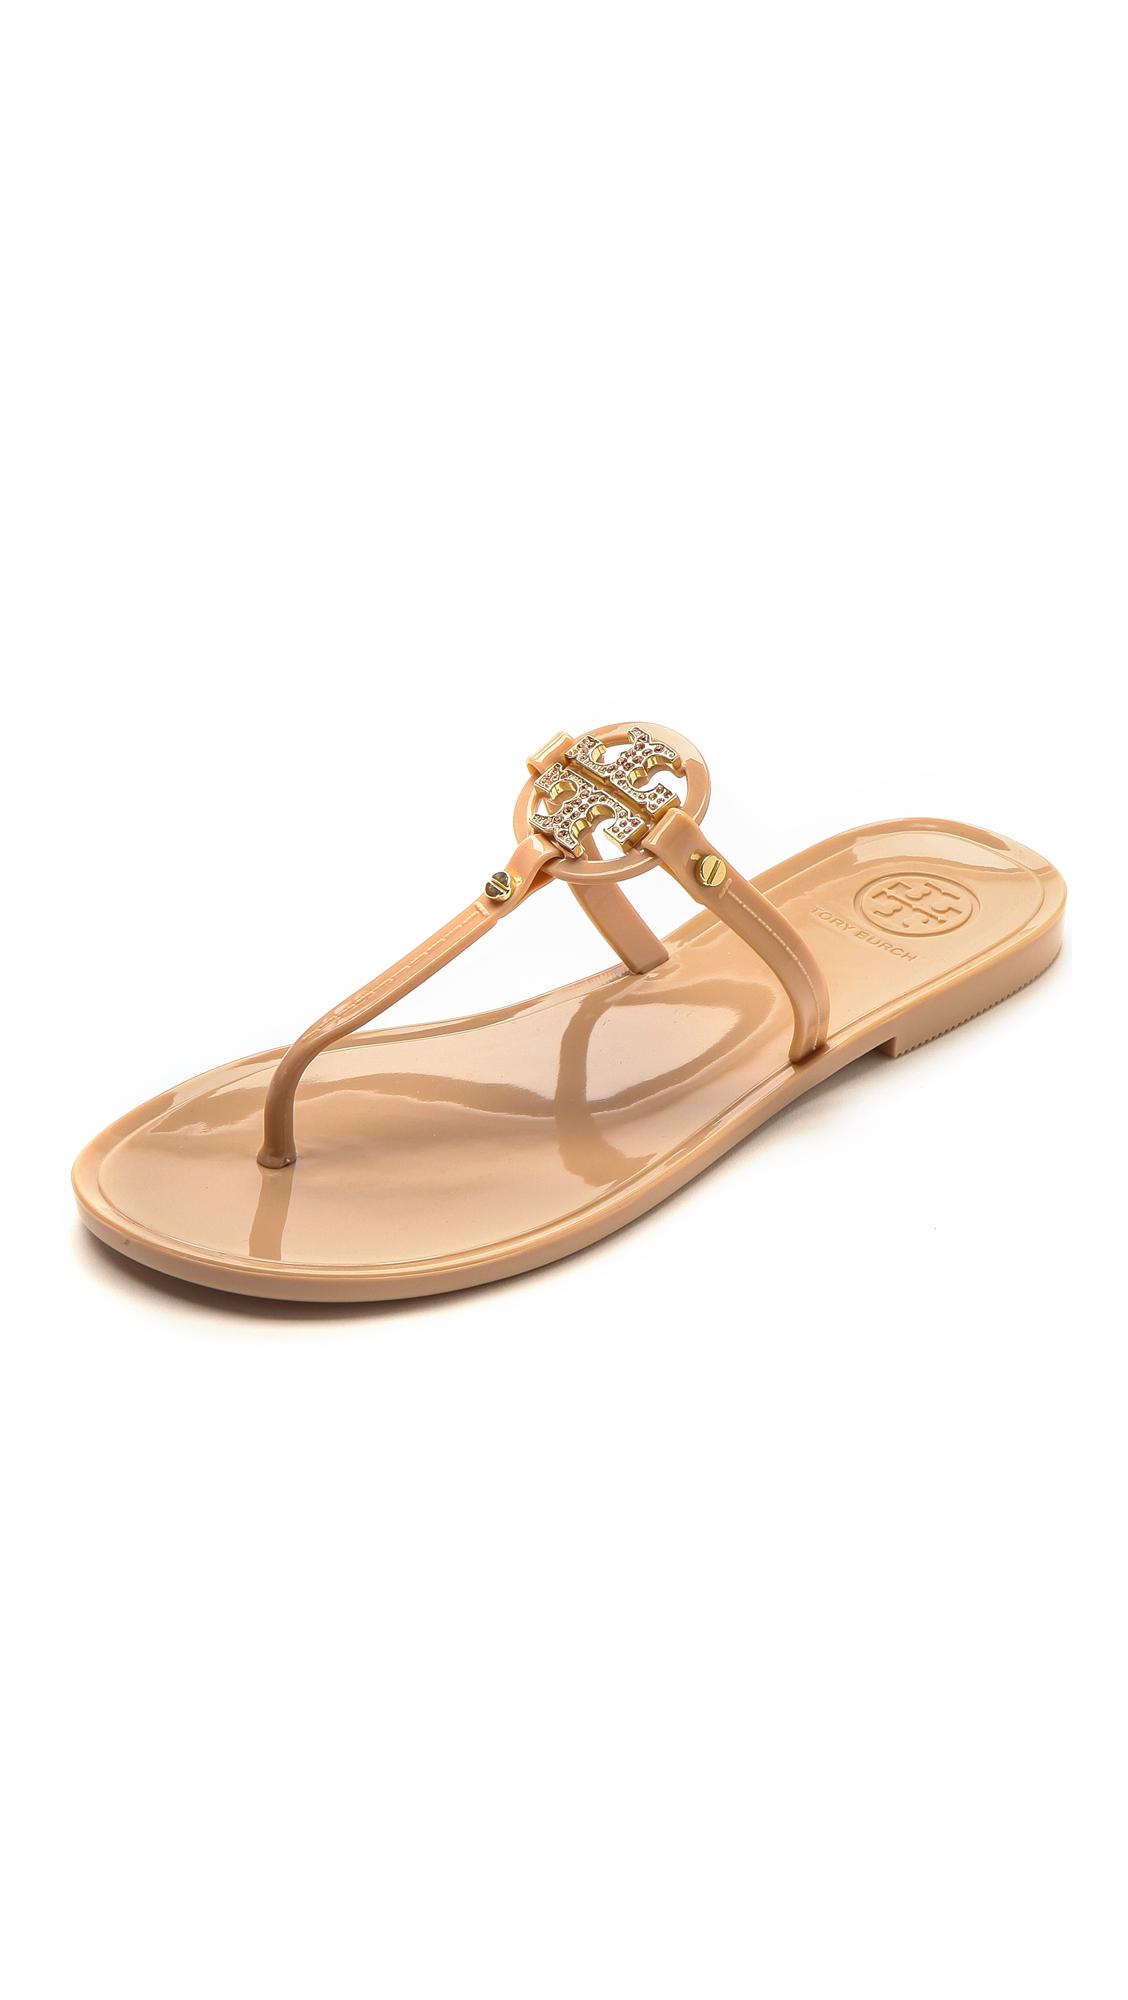 ea09ca956dd516 ... promo code lyst tory burch mini miller flat thong sandals blush in pink  a3702 343ed